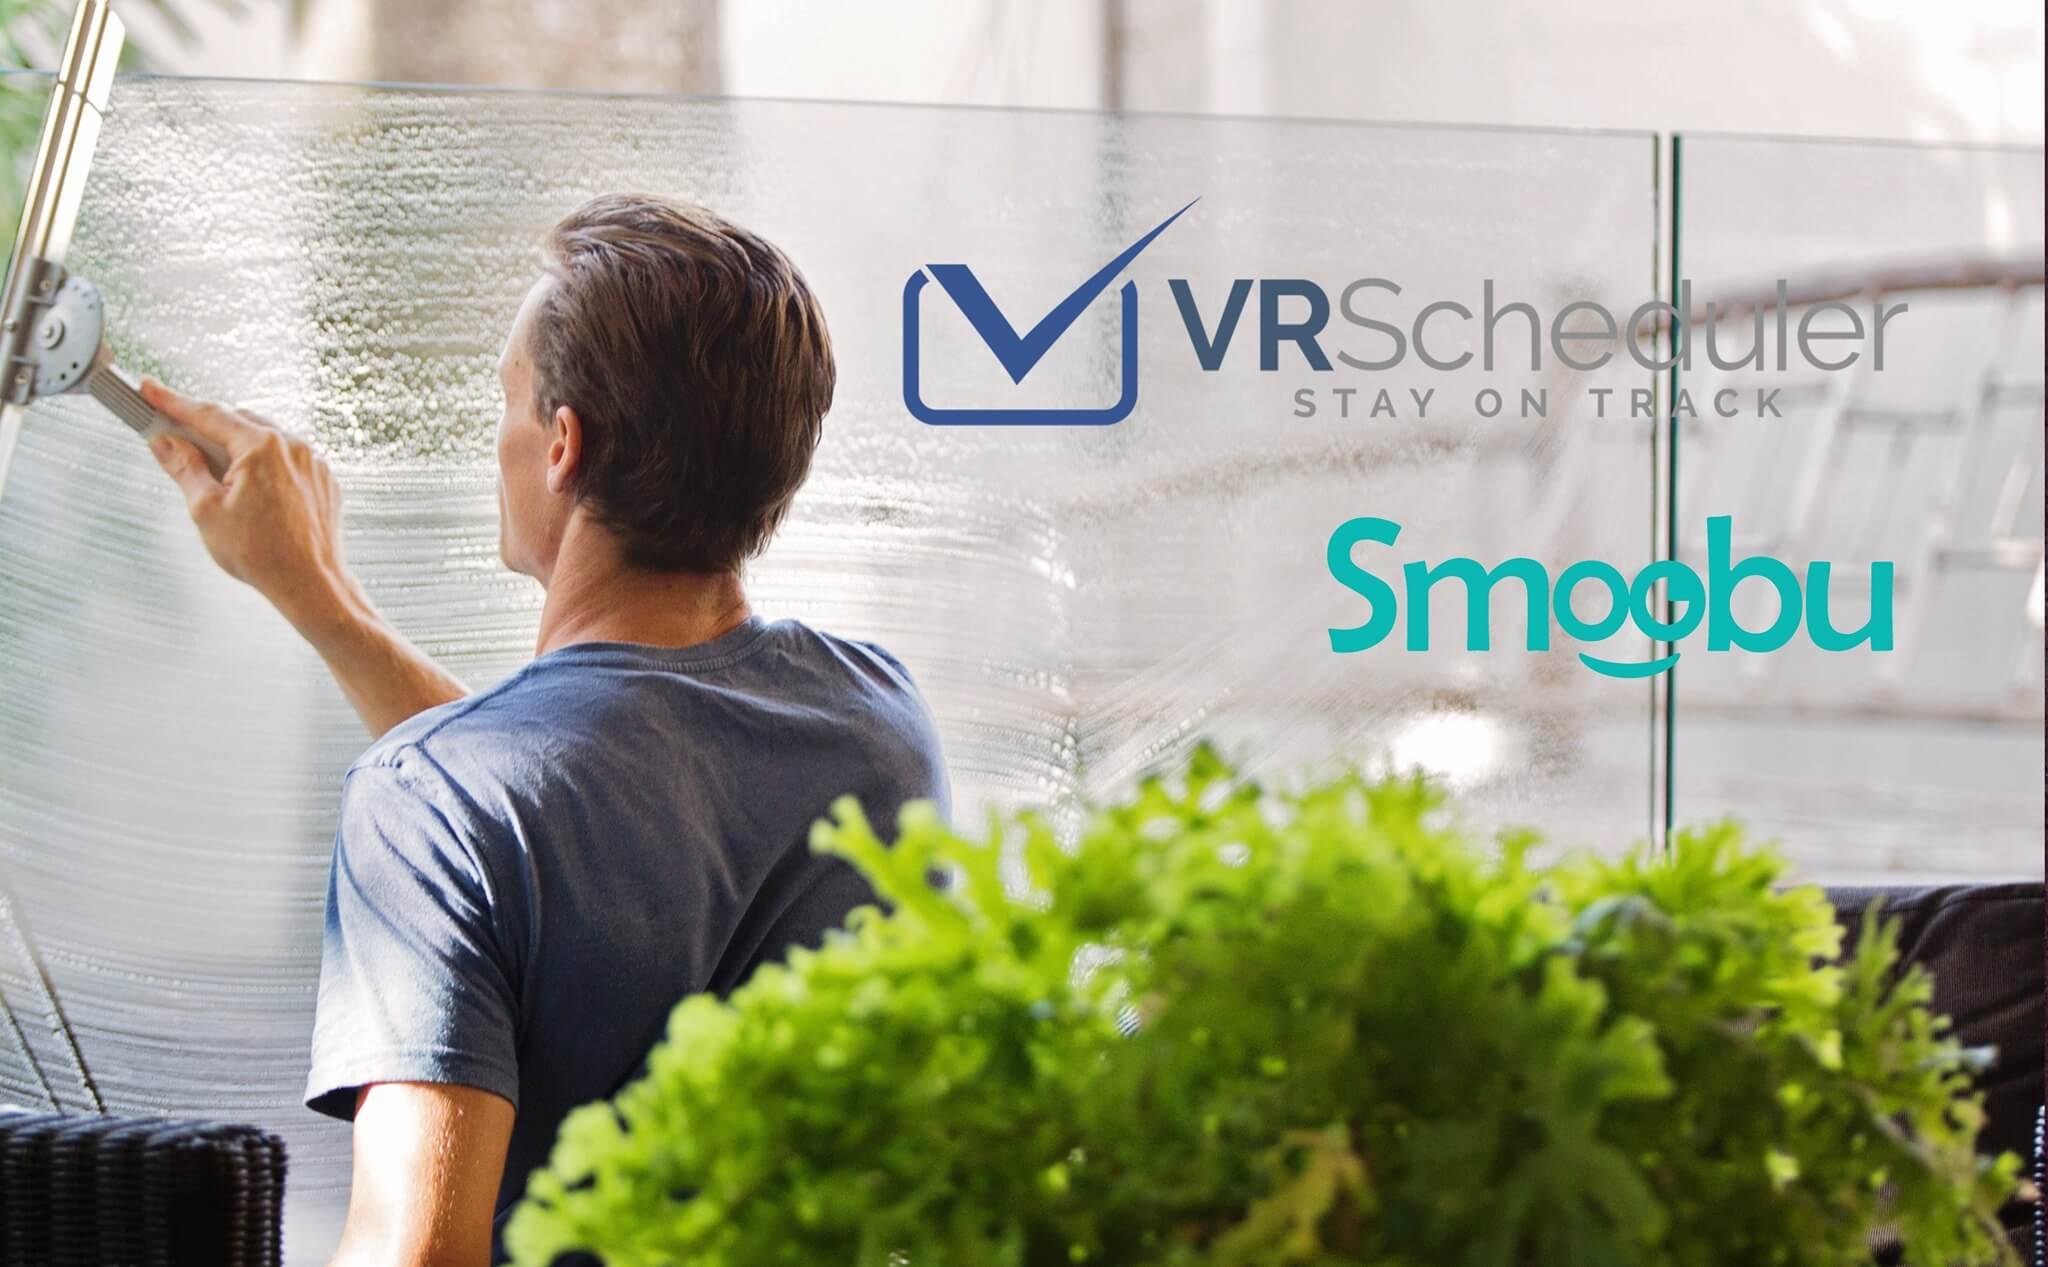 Task Management, Task management Tool VR Scheduler now Integrated with Smoobu